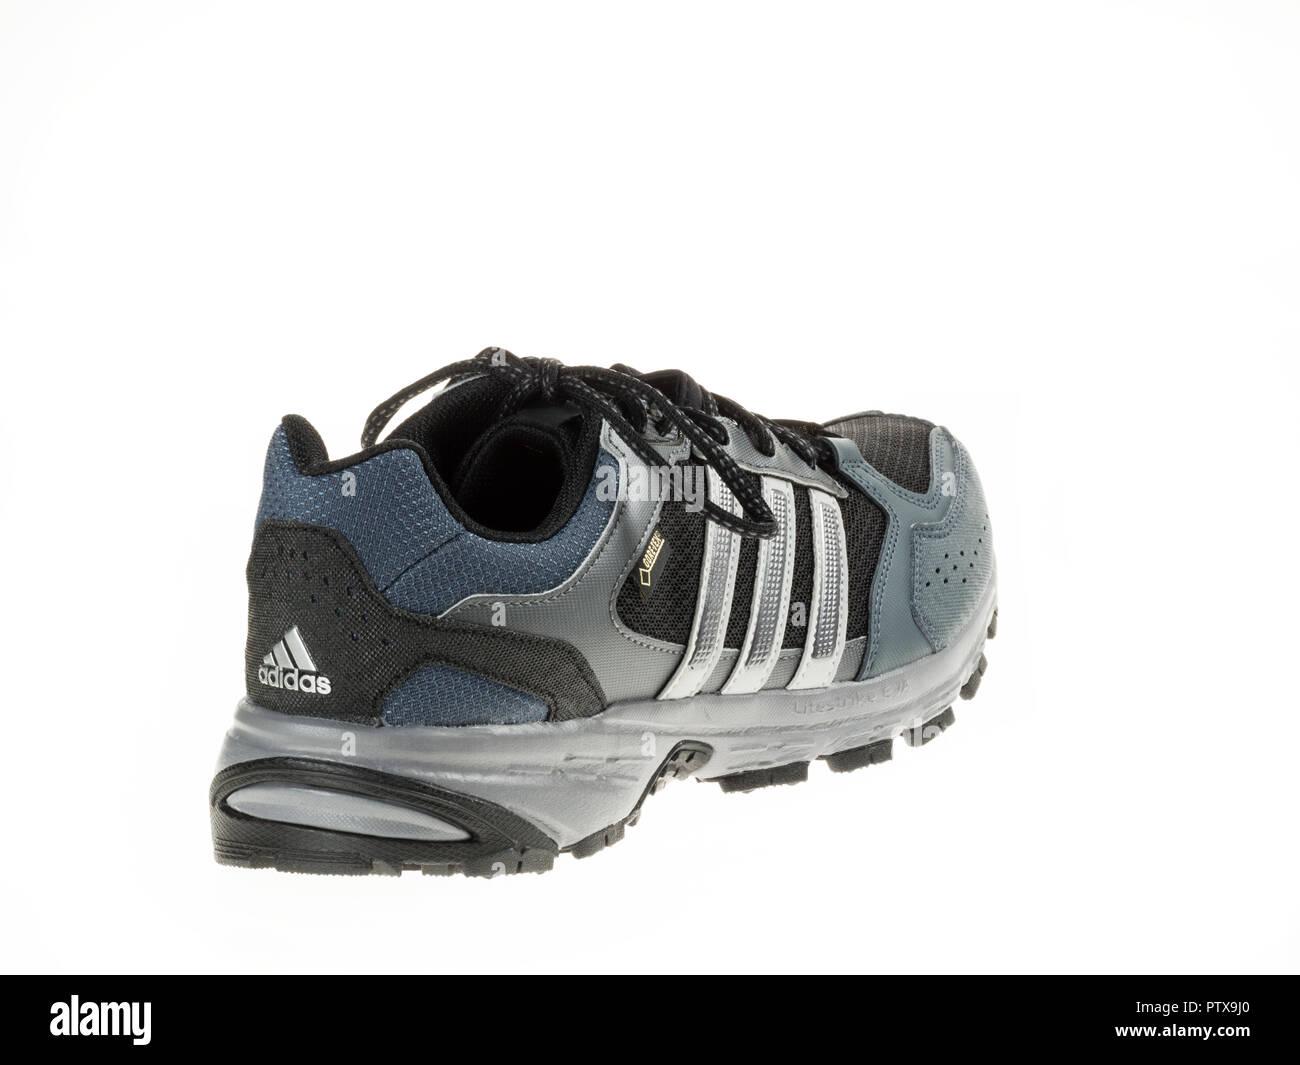 adidas neue schuhe 2014